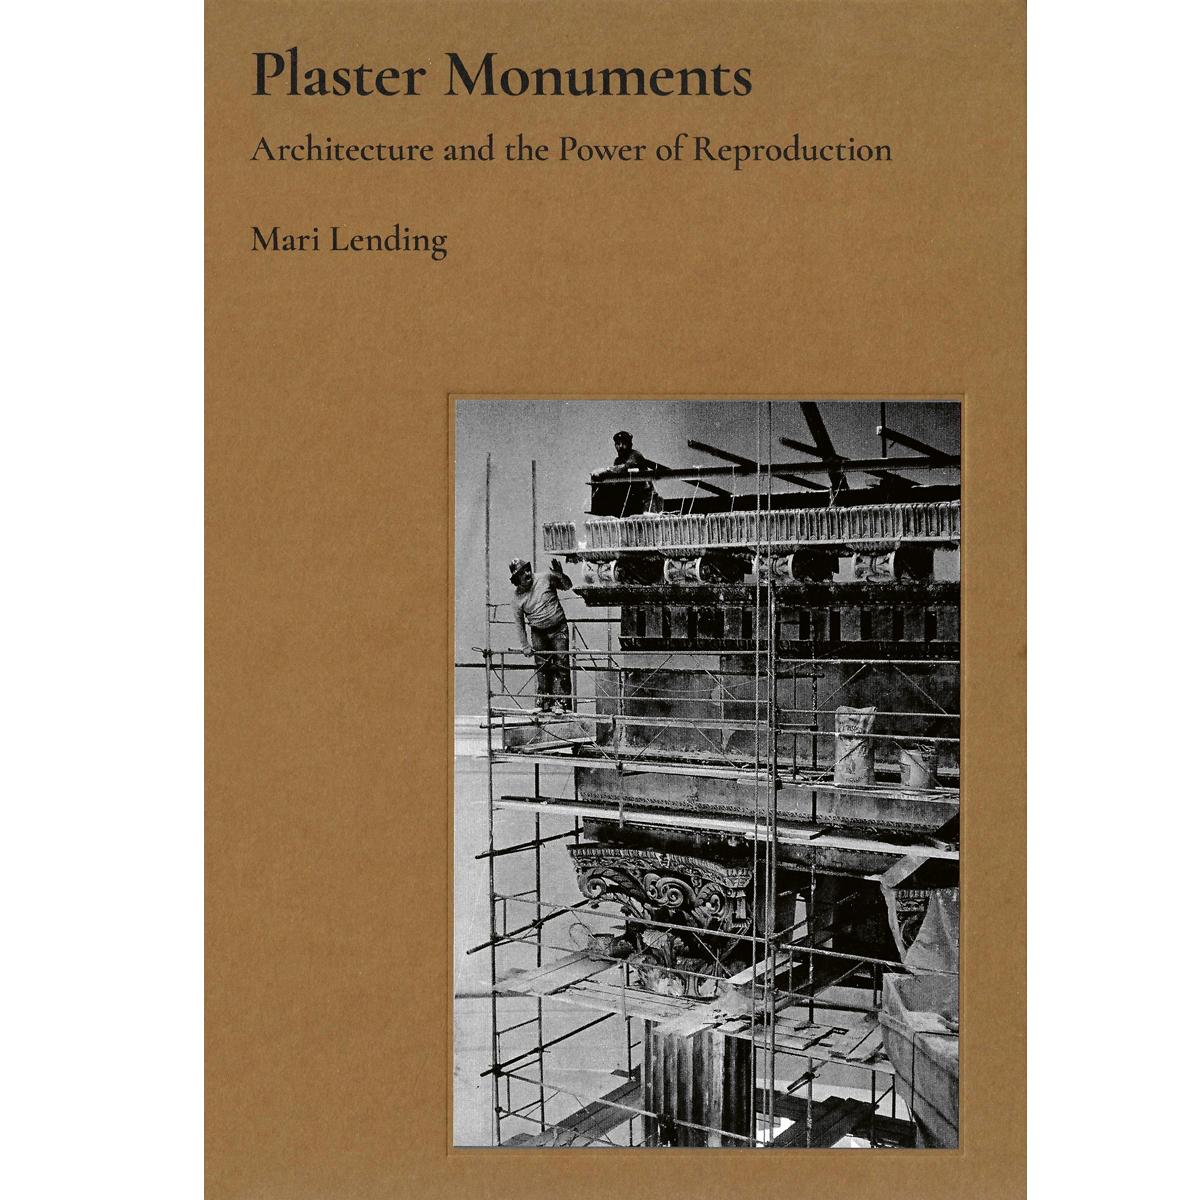 Plaster Monuments